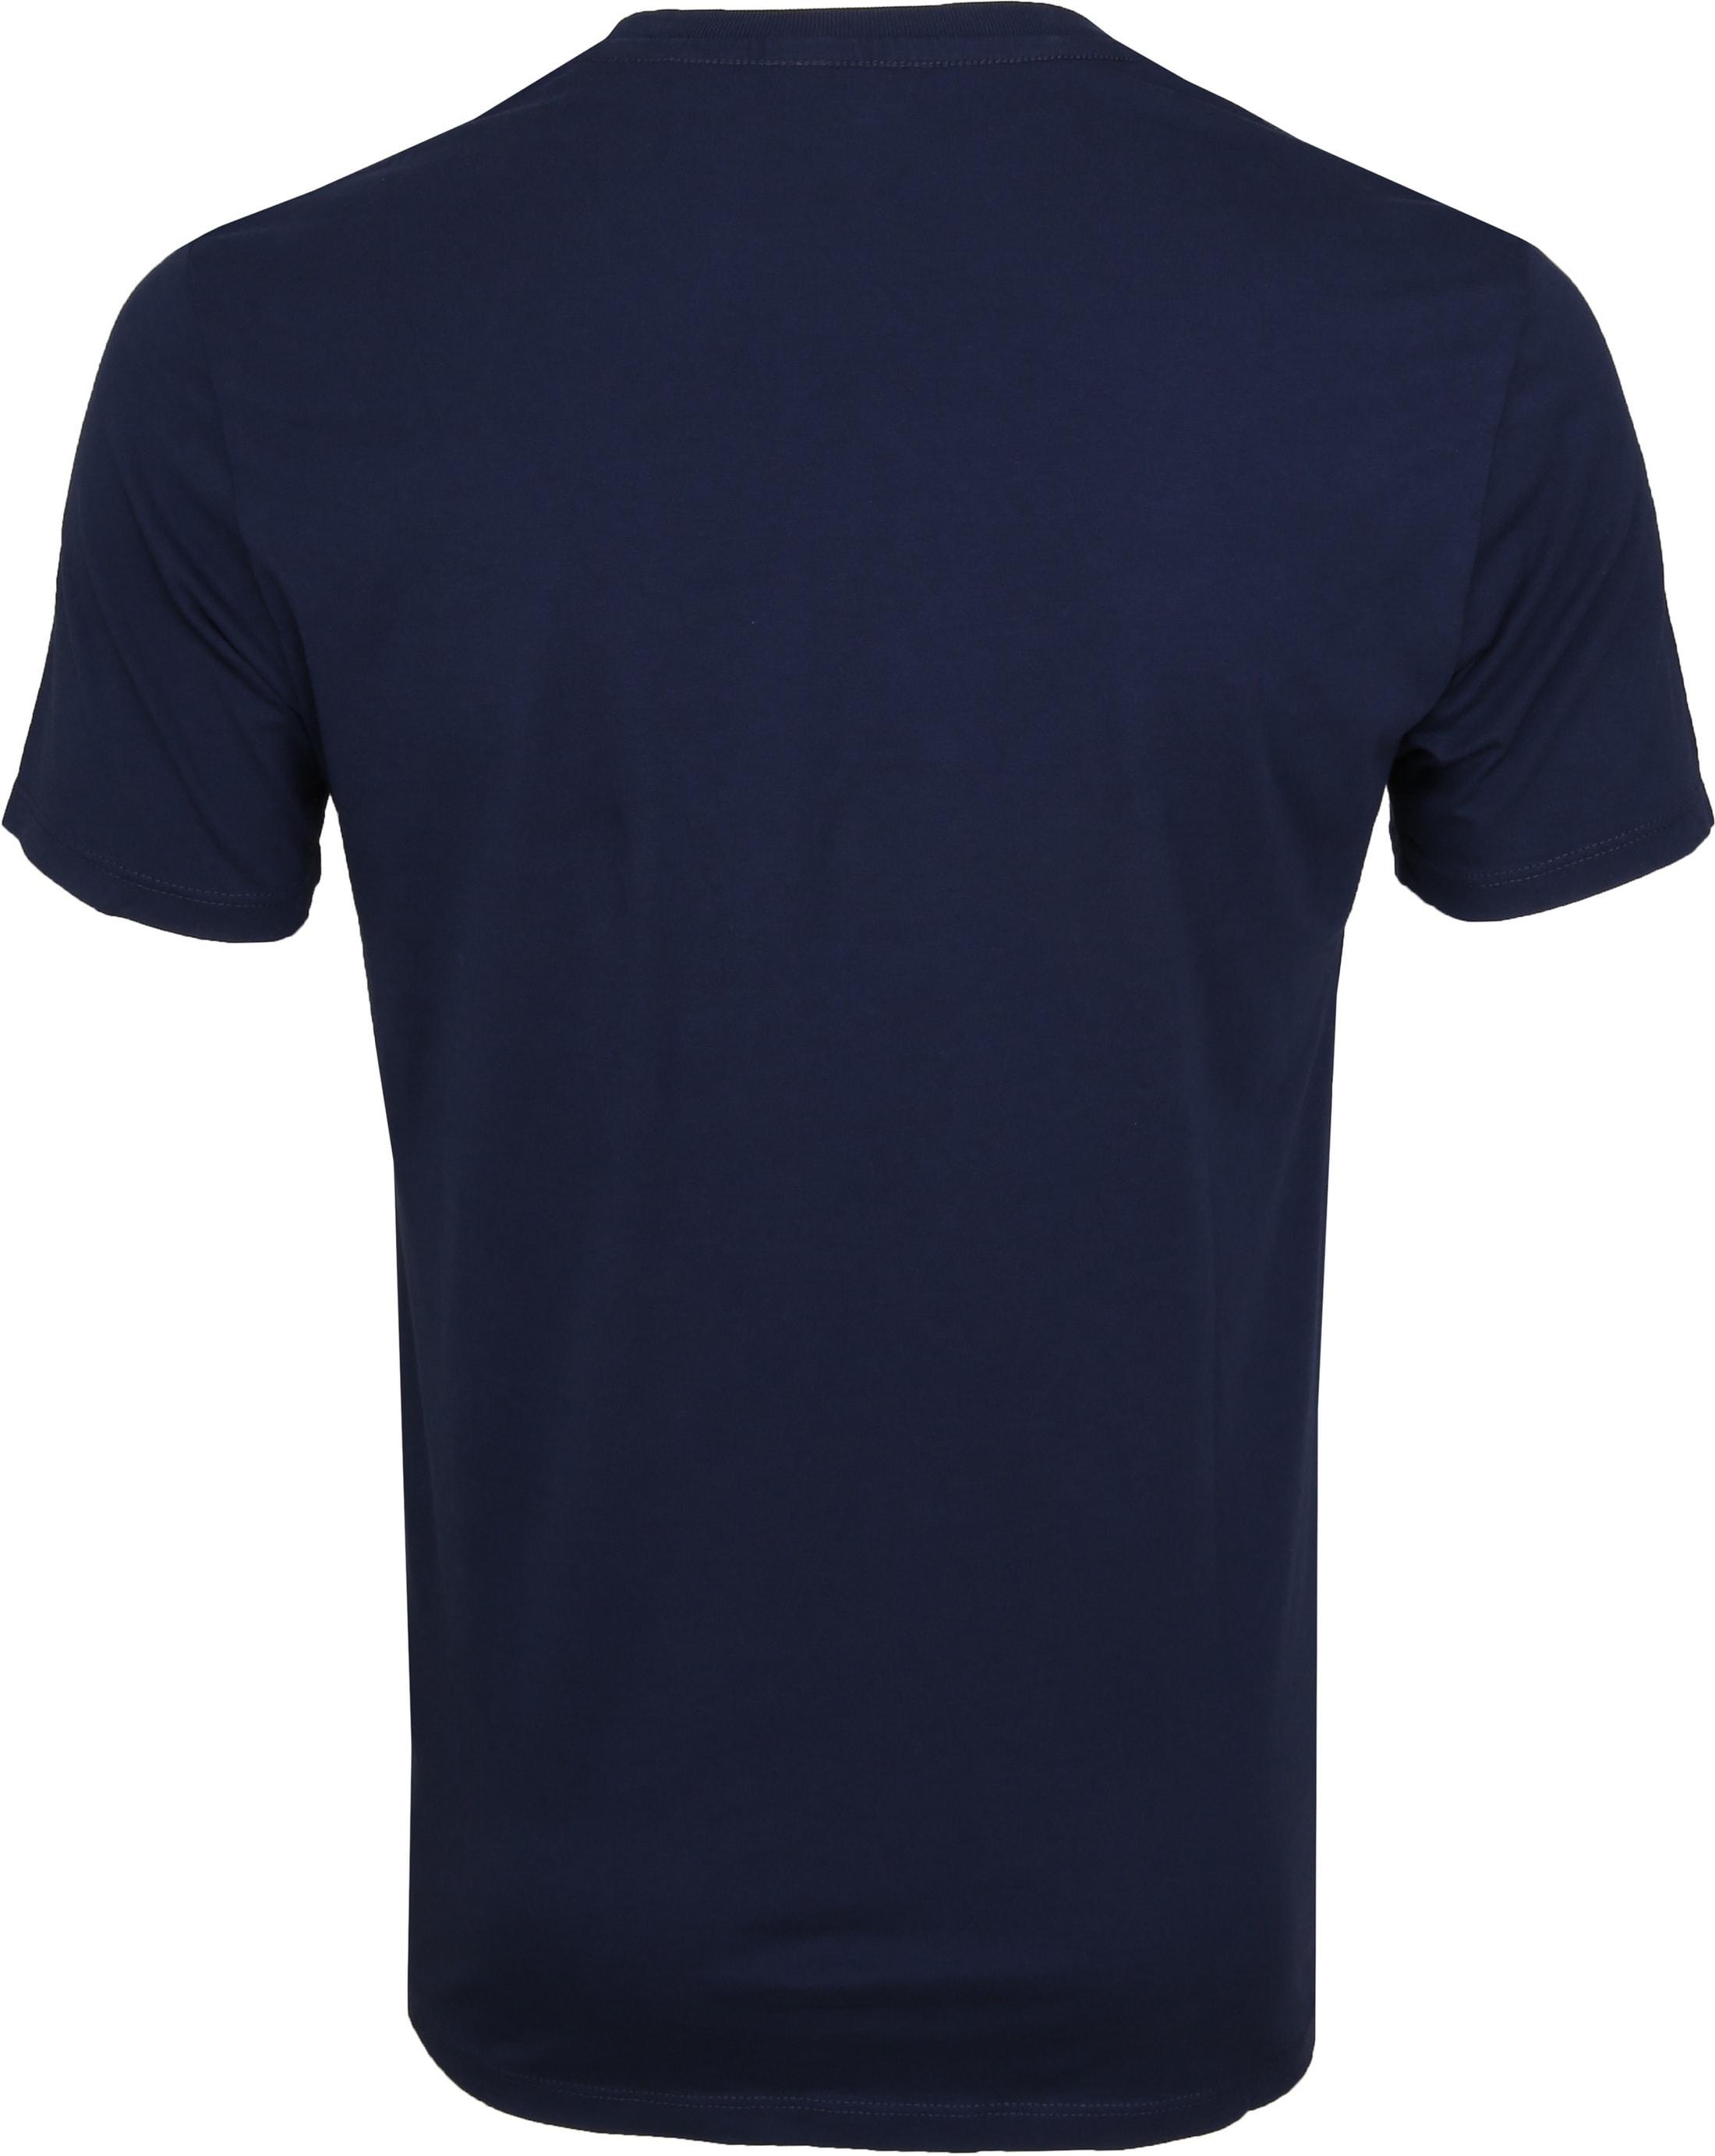 Levi's T-shirt Classic Logo Navy foto 2